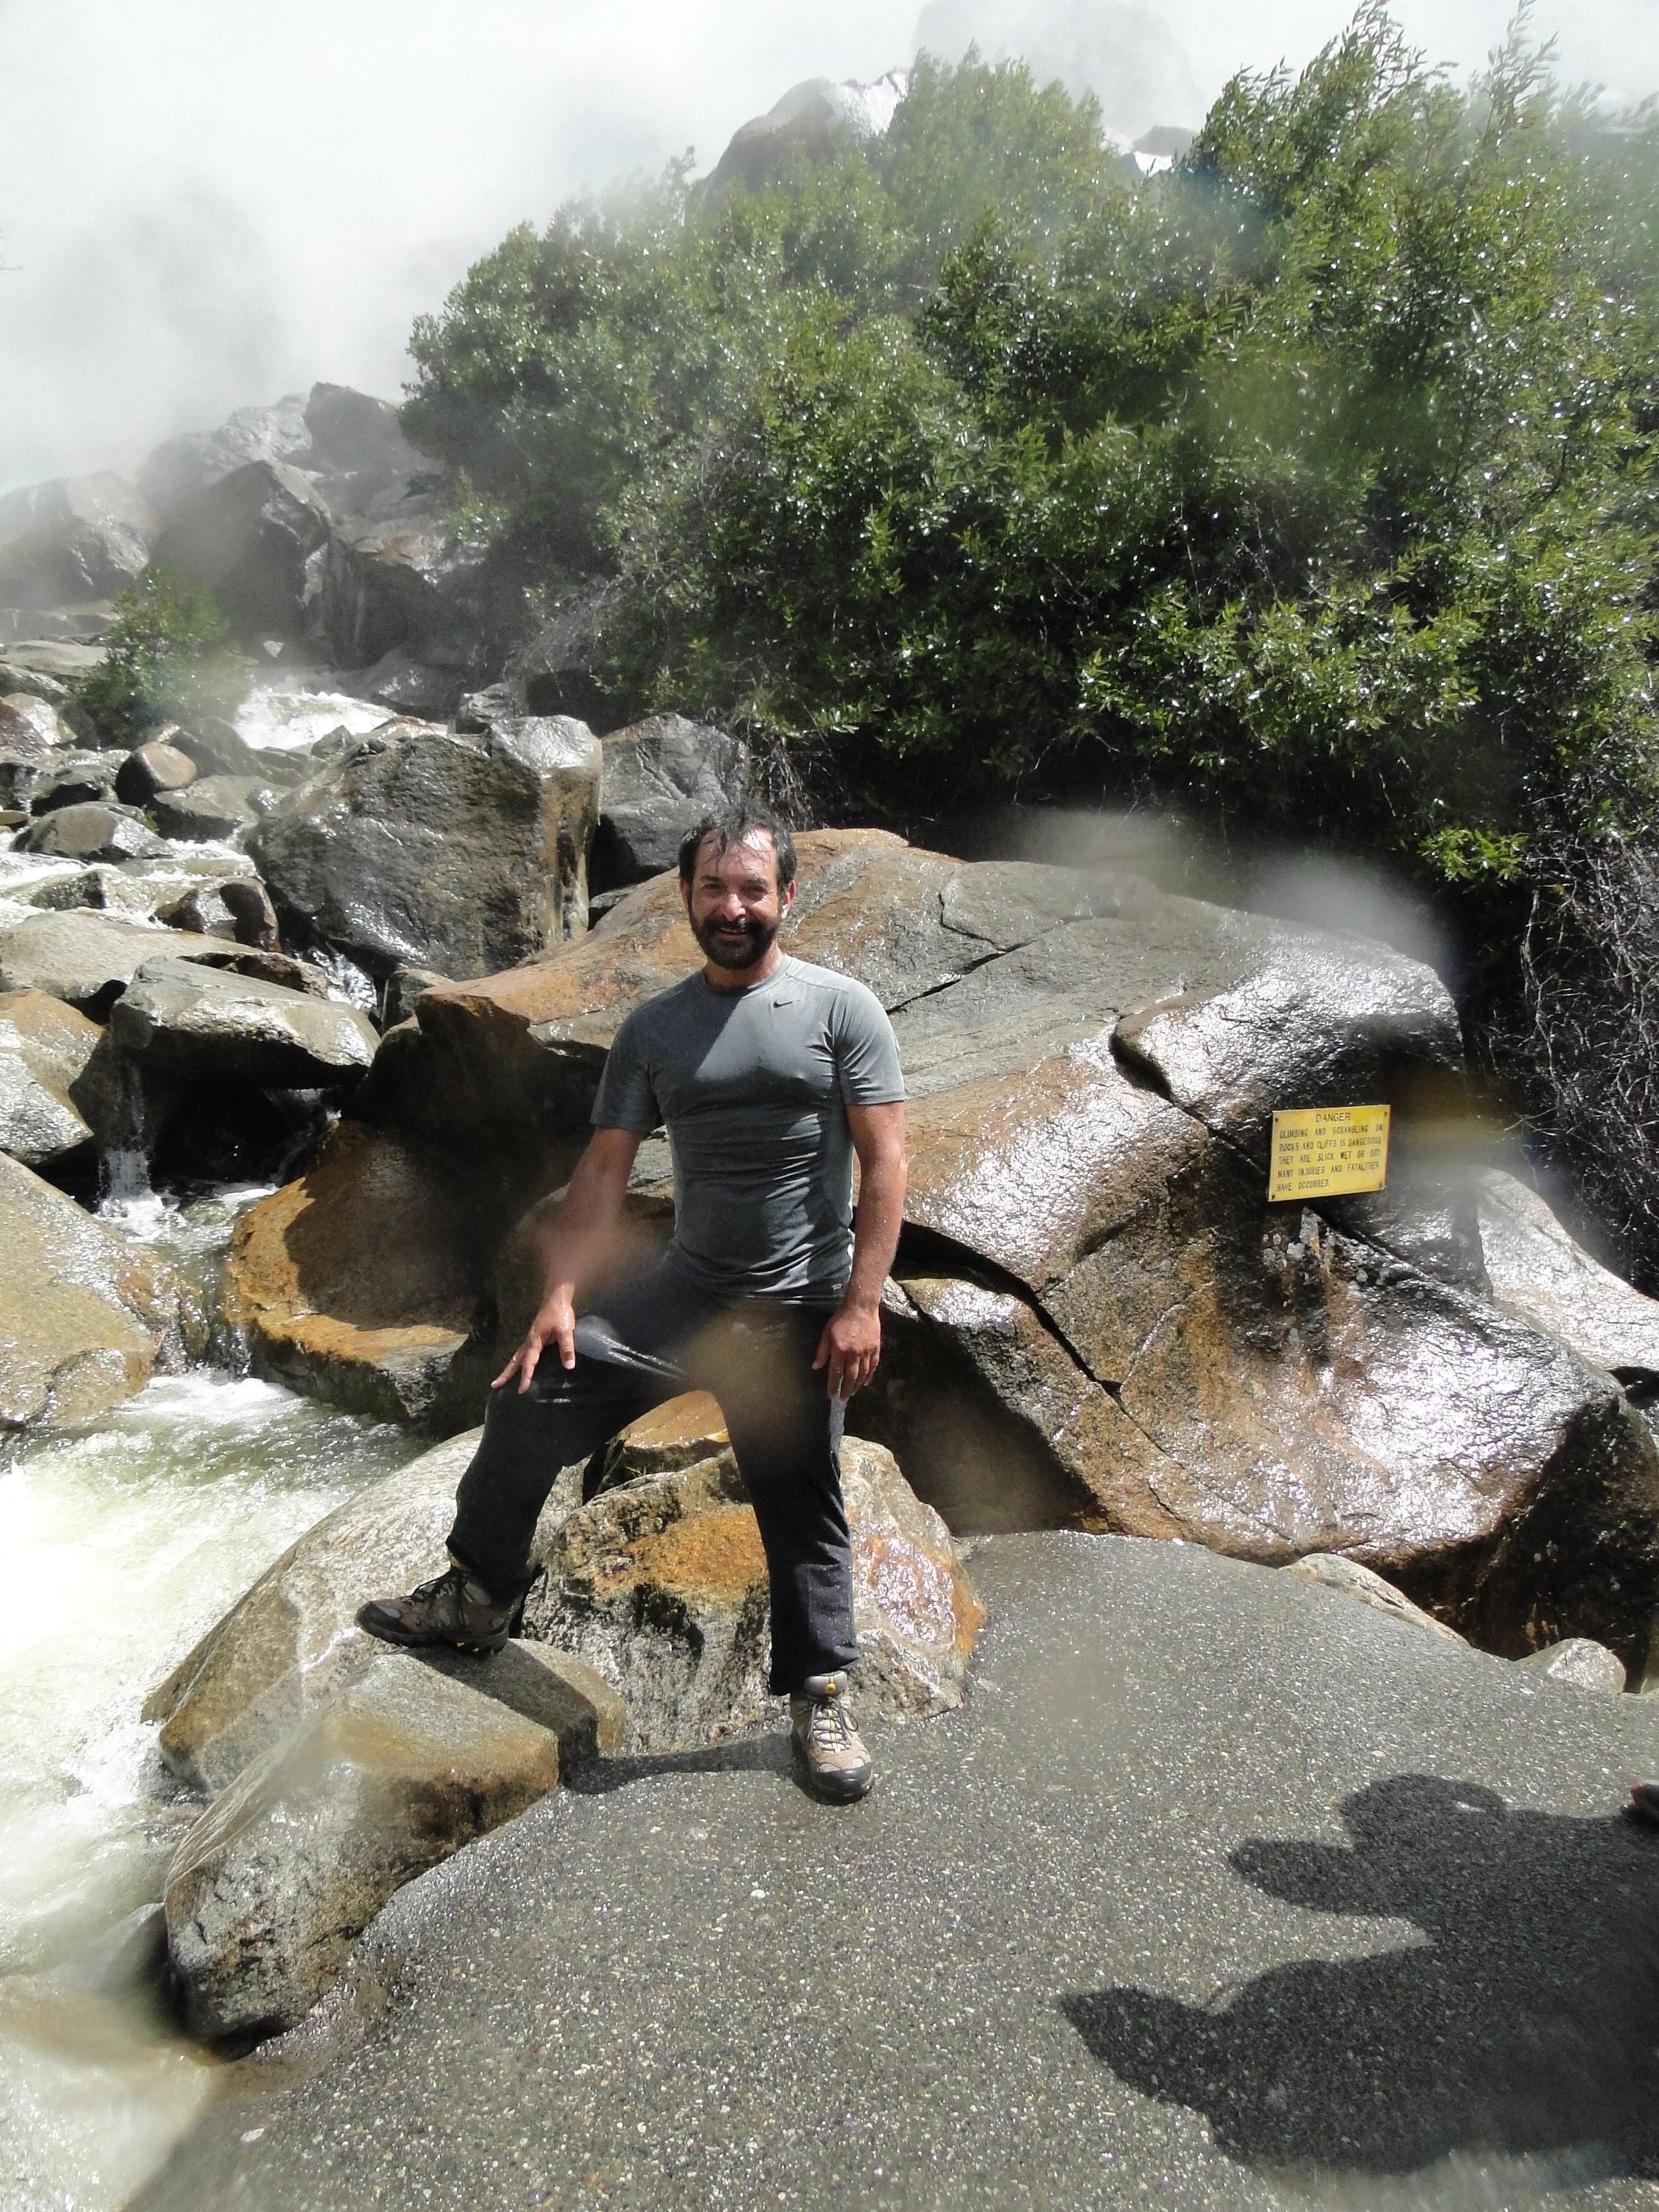 A freezing shower at Bridalveil Fall - Yosemite National Park